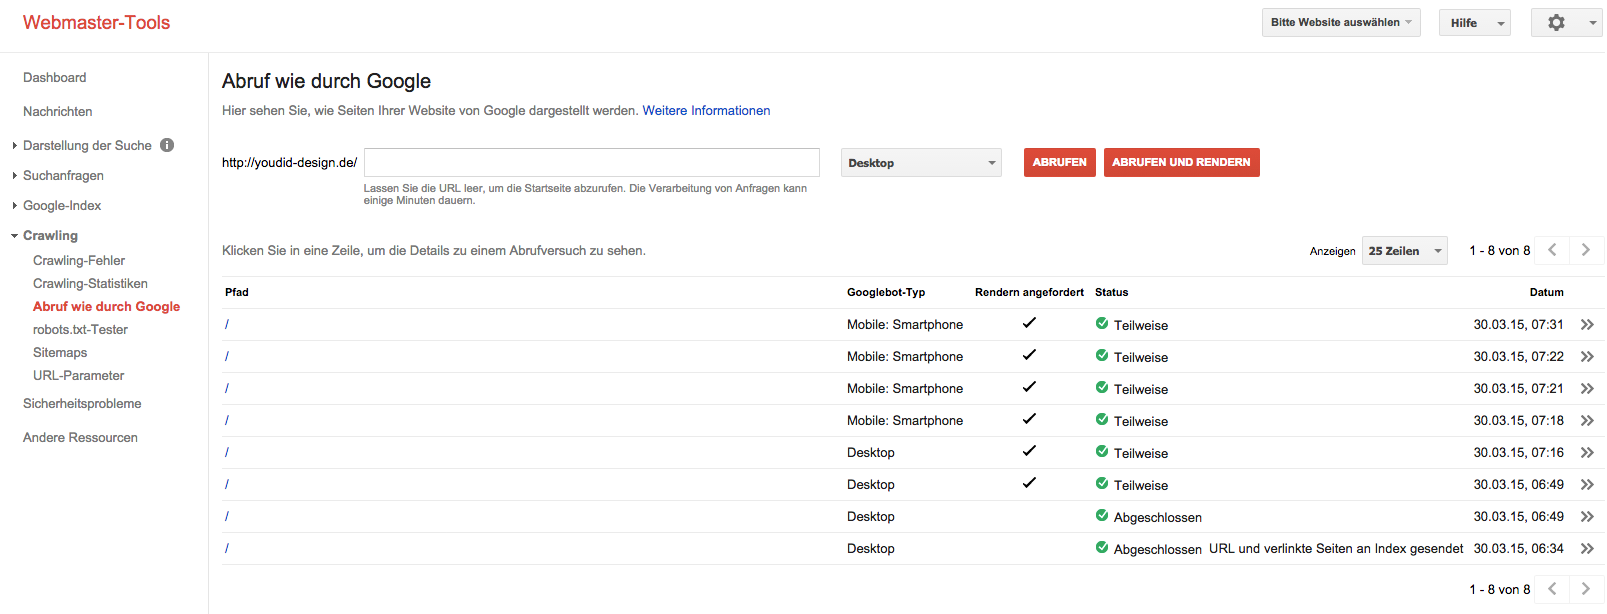 Google Webmaster Tools Abruf wie durch Google | www.youdid-design.de